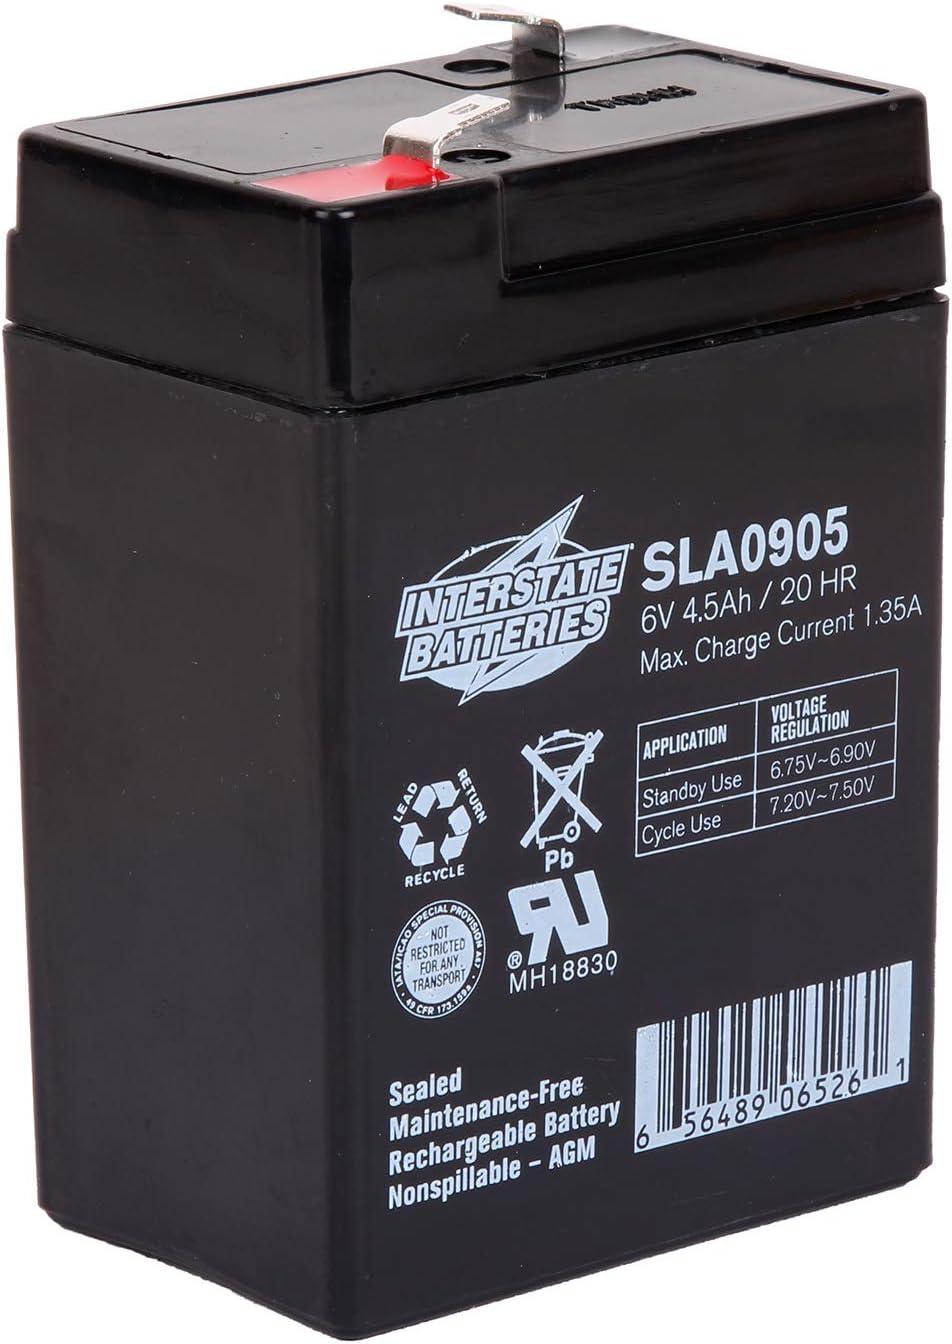 Interstate Batteries 6V 4.5Ah Rechargeable Battery (SLA0905) Sealed Lead Acid Rechargeable SLA AGM (F1 Terminal) Blood Pressure Monitor, Oxygen & Pulse Meter, Medical Device, Deer Feeder : Electronics